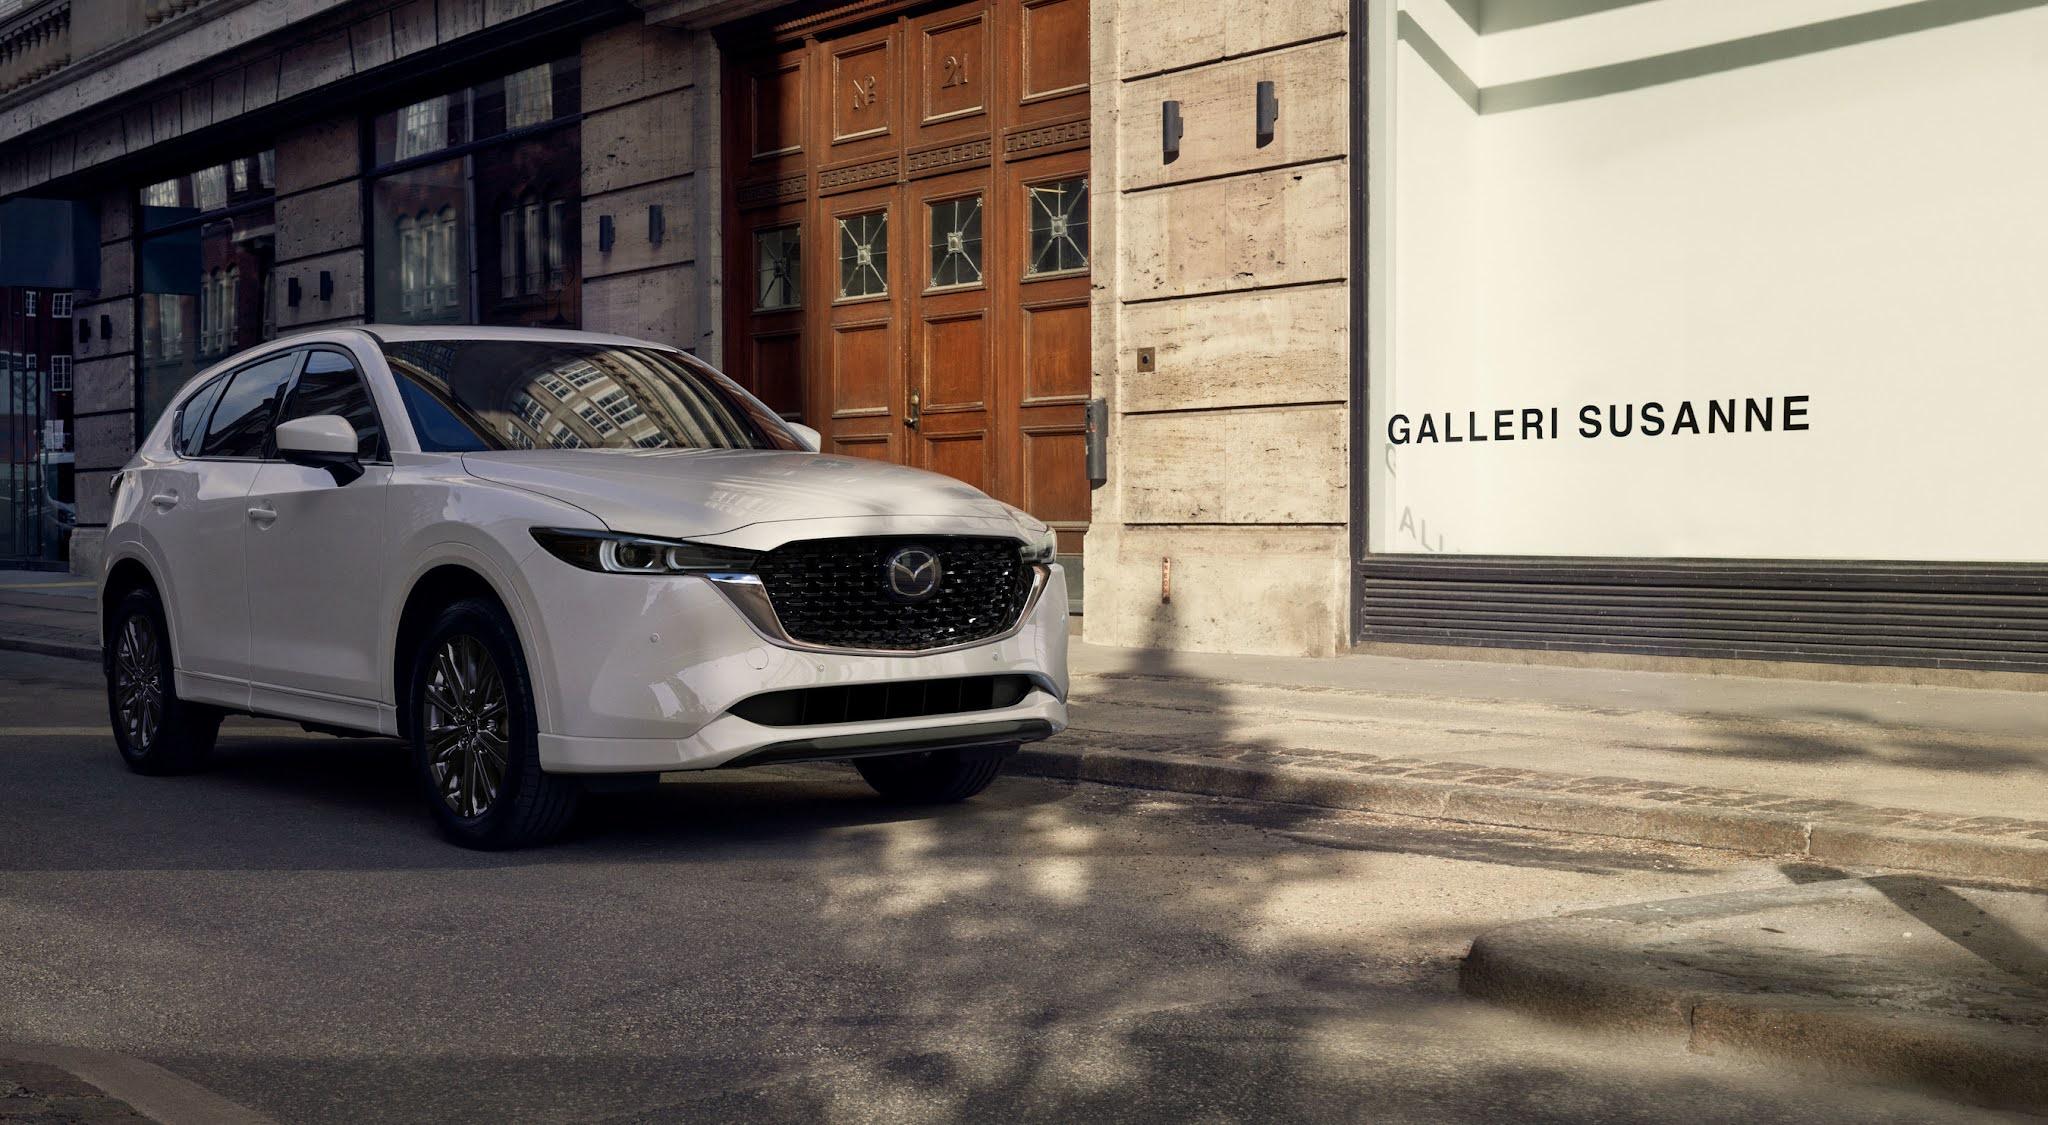 2022 Mazda CX-5 Receives Elegant Enhancements